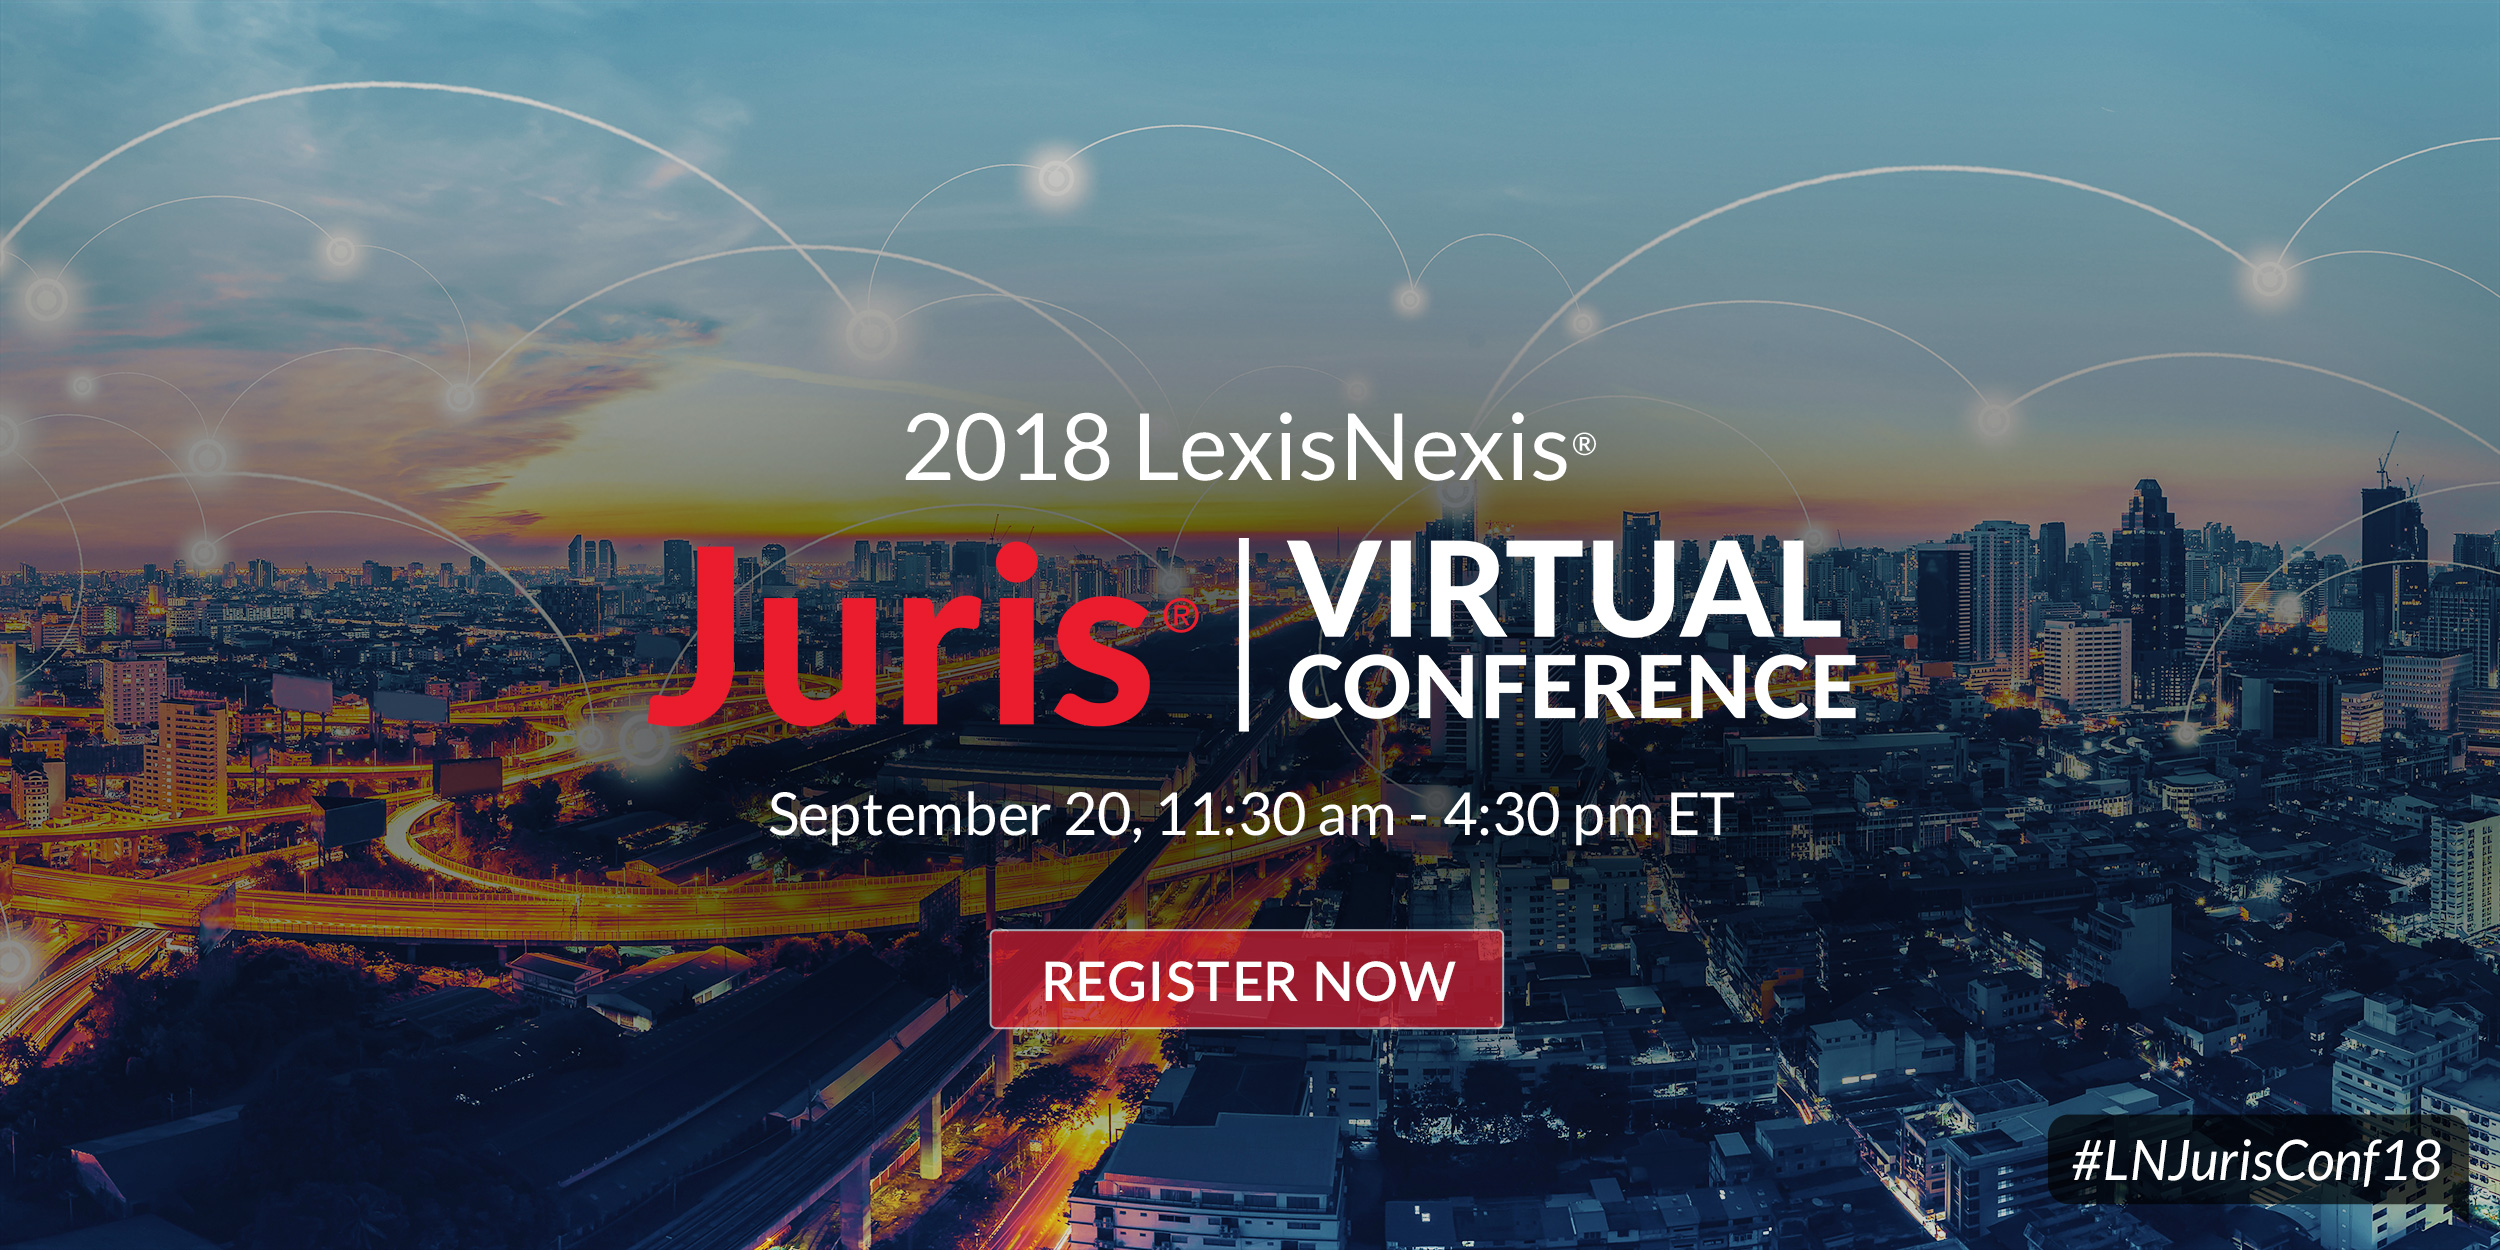 000944-Juris-Virtual-Conference-webhero2-2500x1250